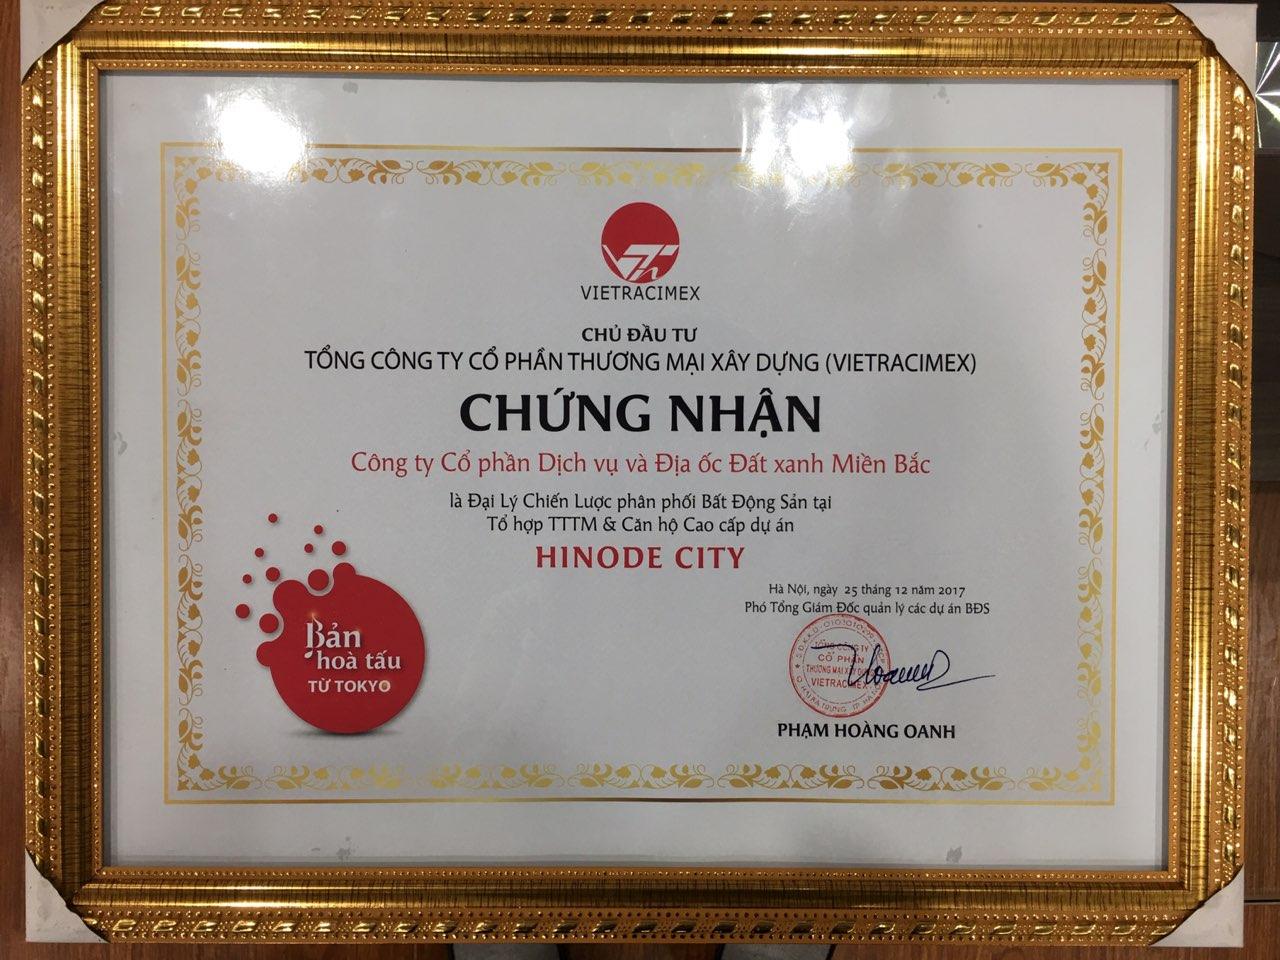 chung-nhan-phan-phoi-hinode-city-201-minh-khai